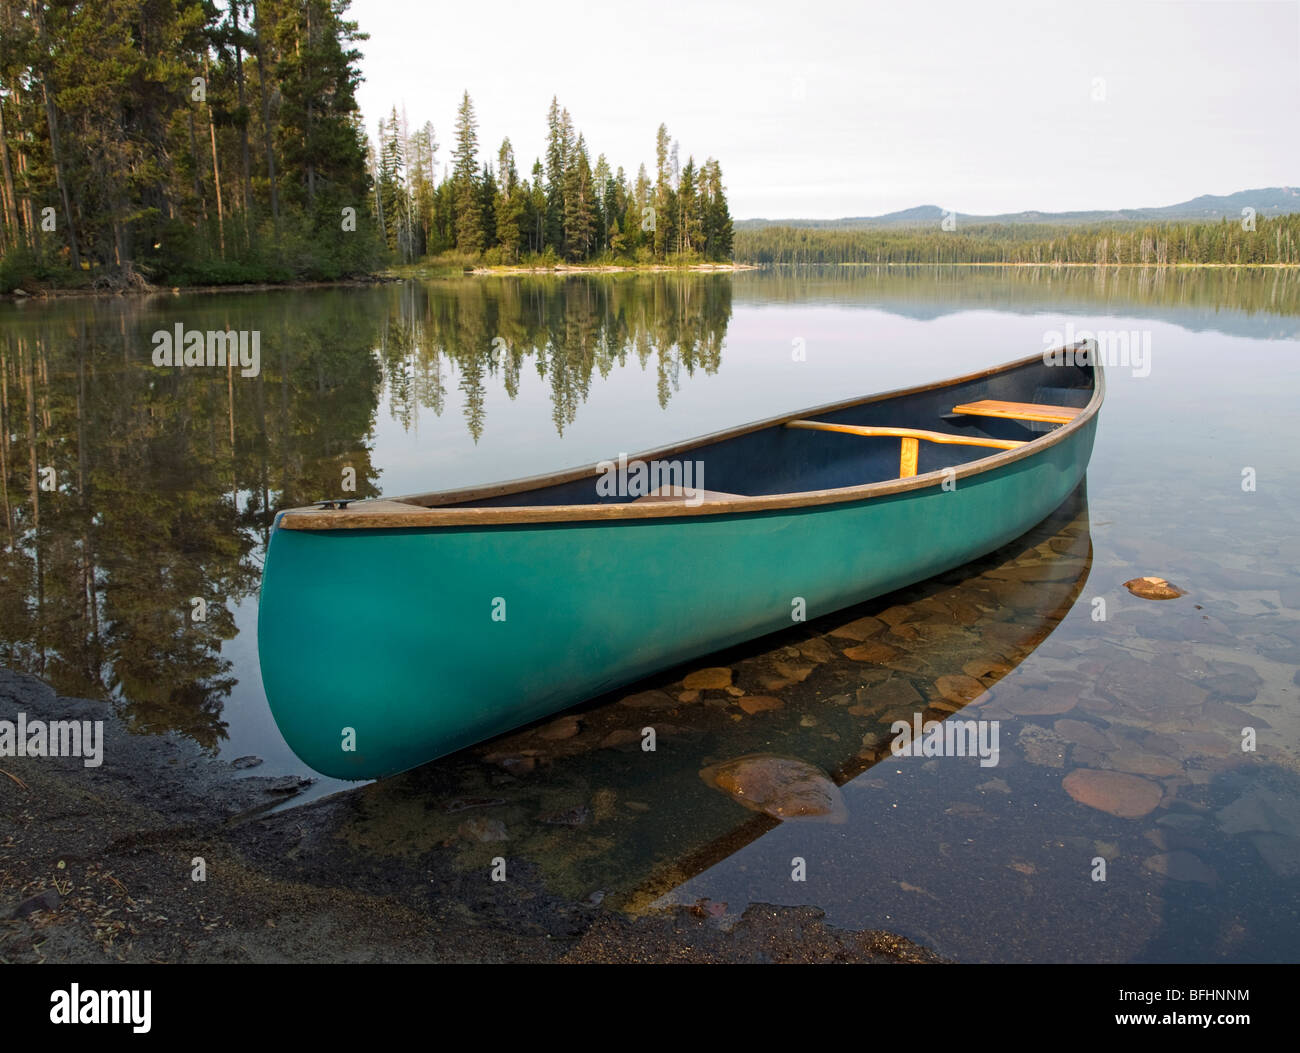 Canoe on a mountain lake in the Oregon Cascade Mountains along the Cascade Lakes Highway - Stock Image